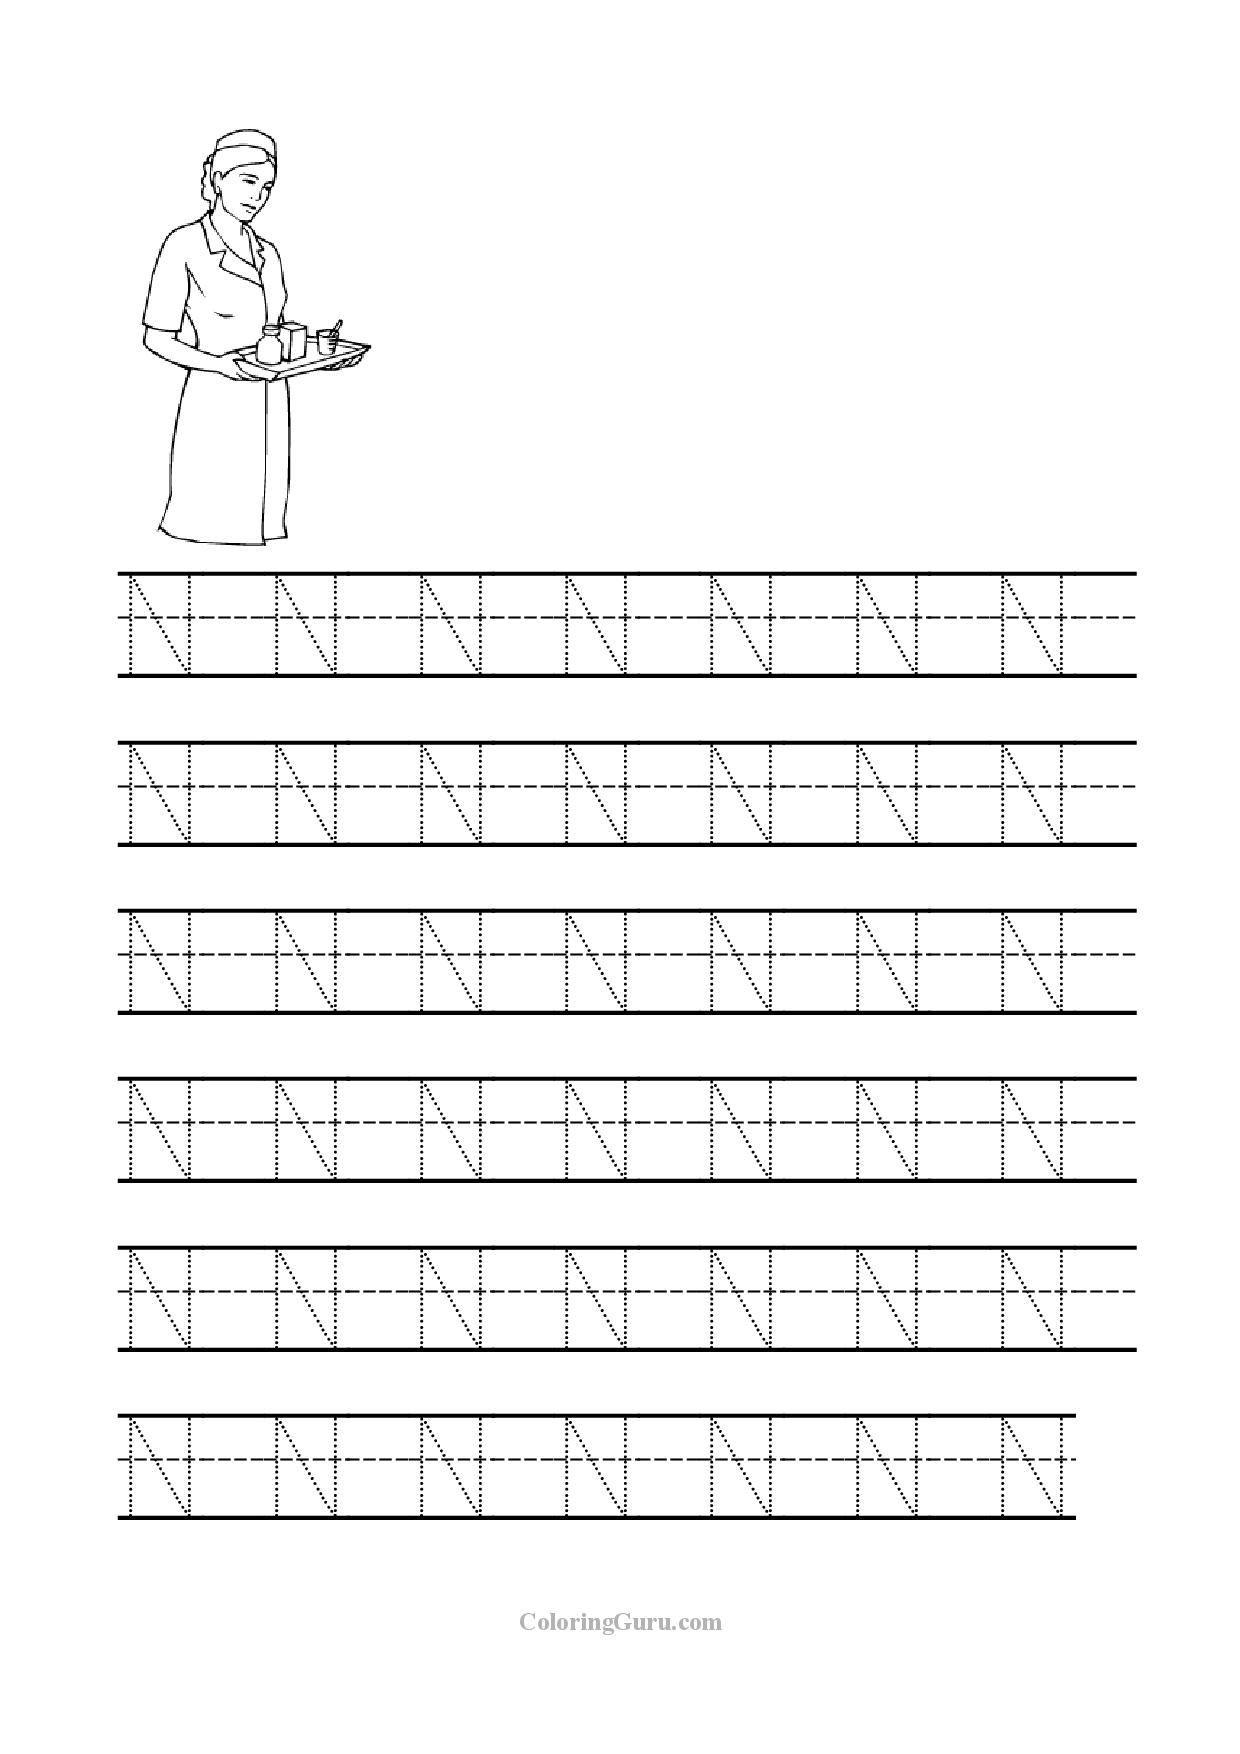 Letter N Worksheets for Preschool Free Printable Tracing Letter N Worksheets for Preschool